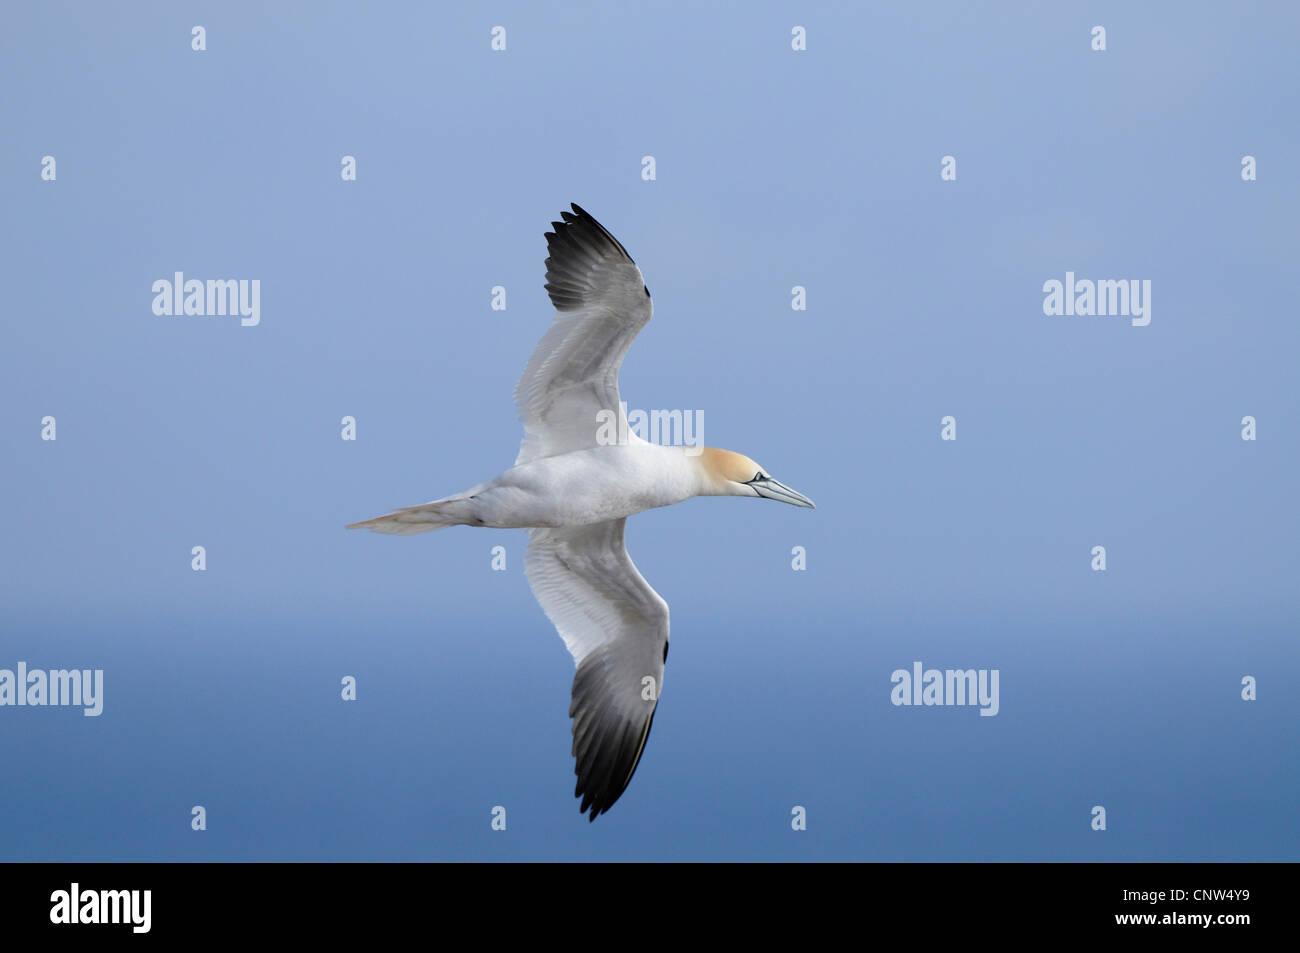 northern gannet (Sula bassana, Morus bassanus), flying, Germany, Heligoland - Stock Image